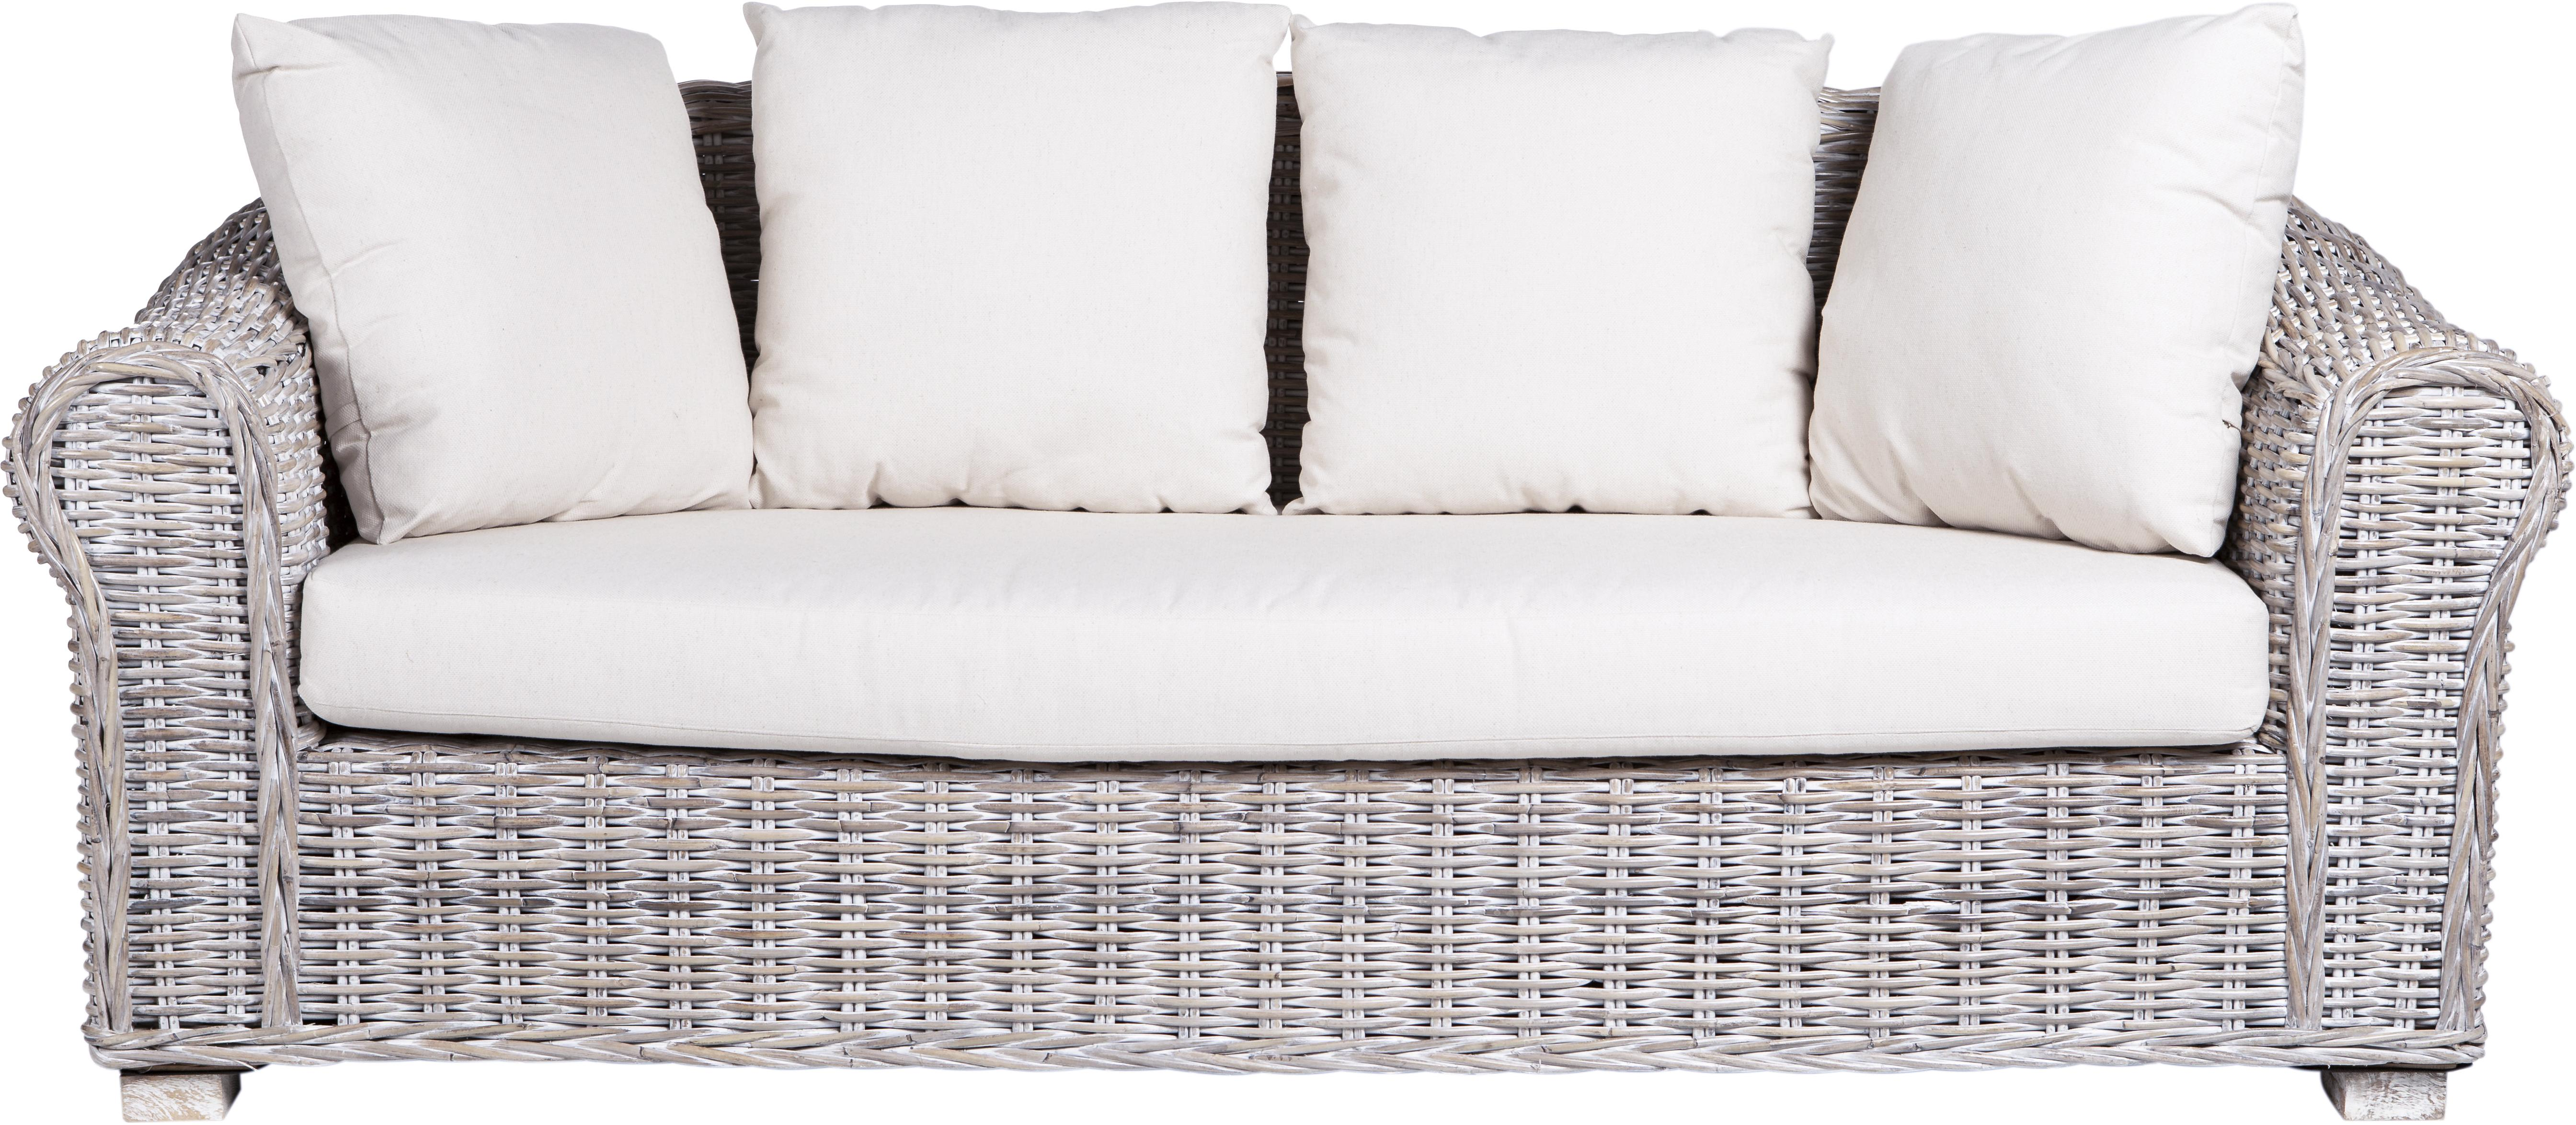 Sofá de exterior Coba (3 plazas), Estructura: ratán, trenzado de kubu, , Patas: madera de mango, Gris, blanco, An 204 x Al 96 cm